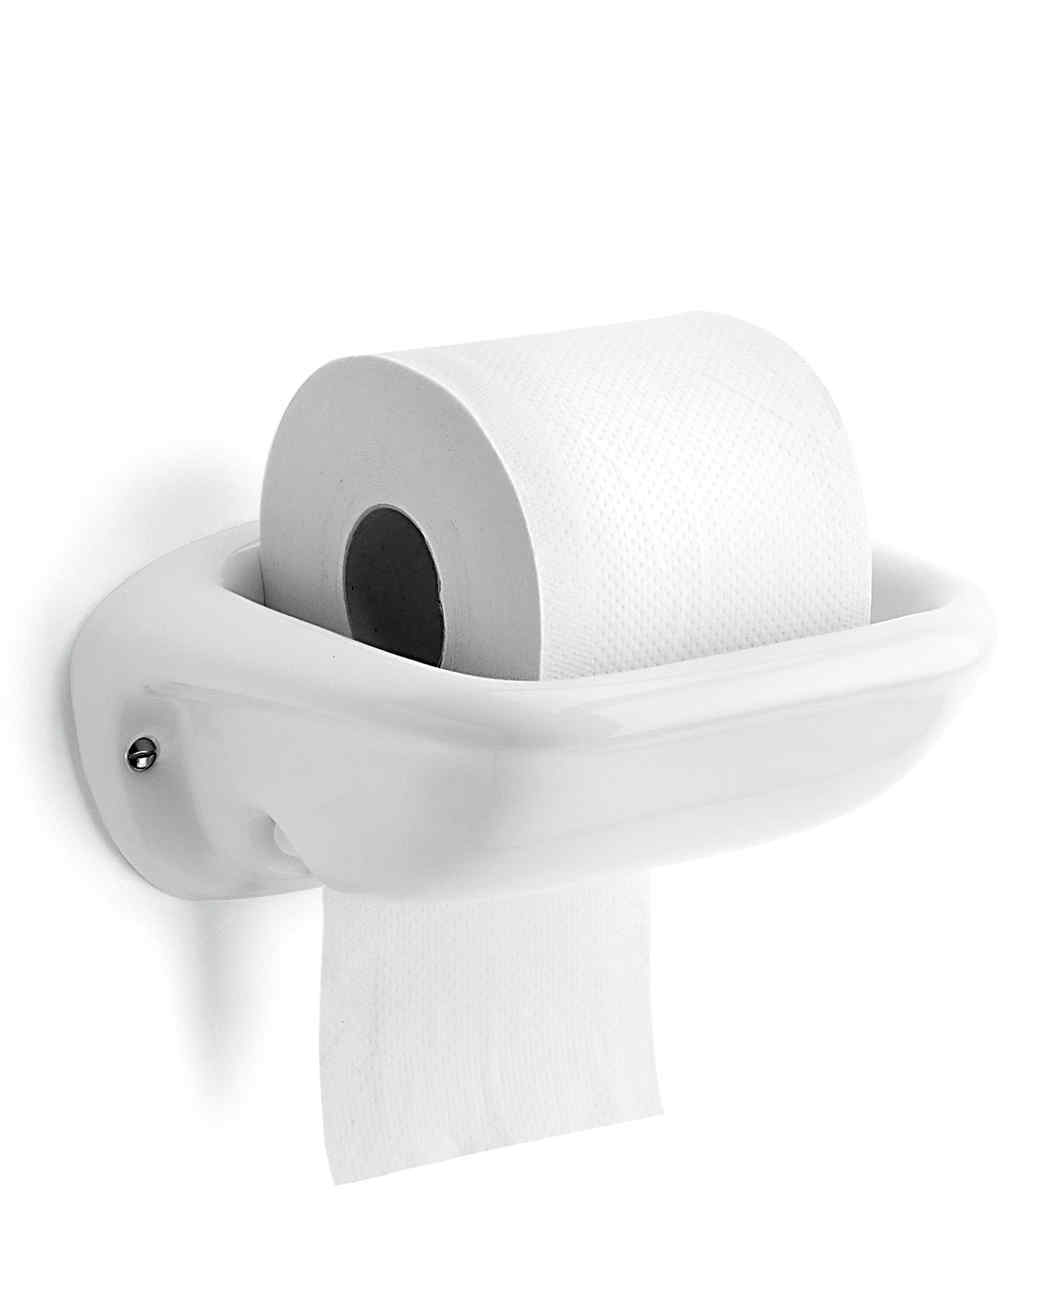 thomas-hoof-toilet-roll-holder-331-95-ms110496.jpg